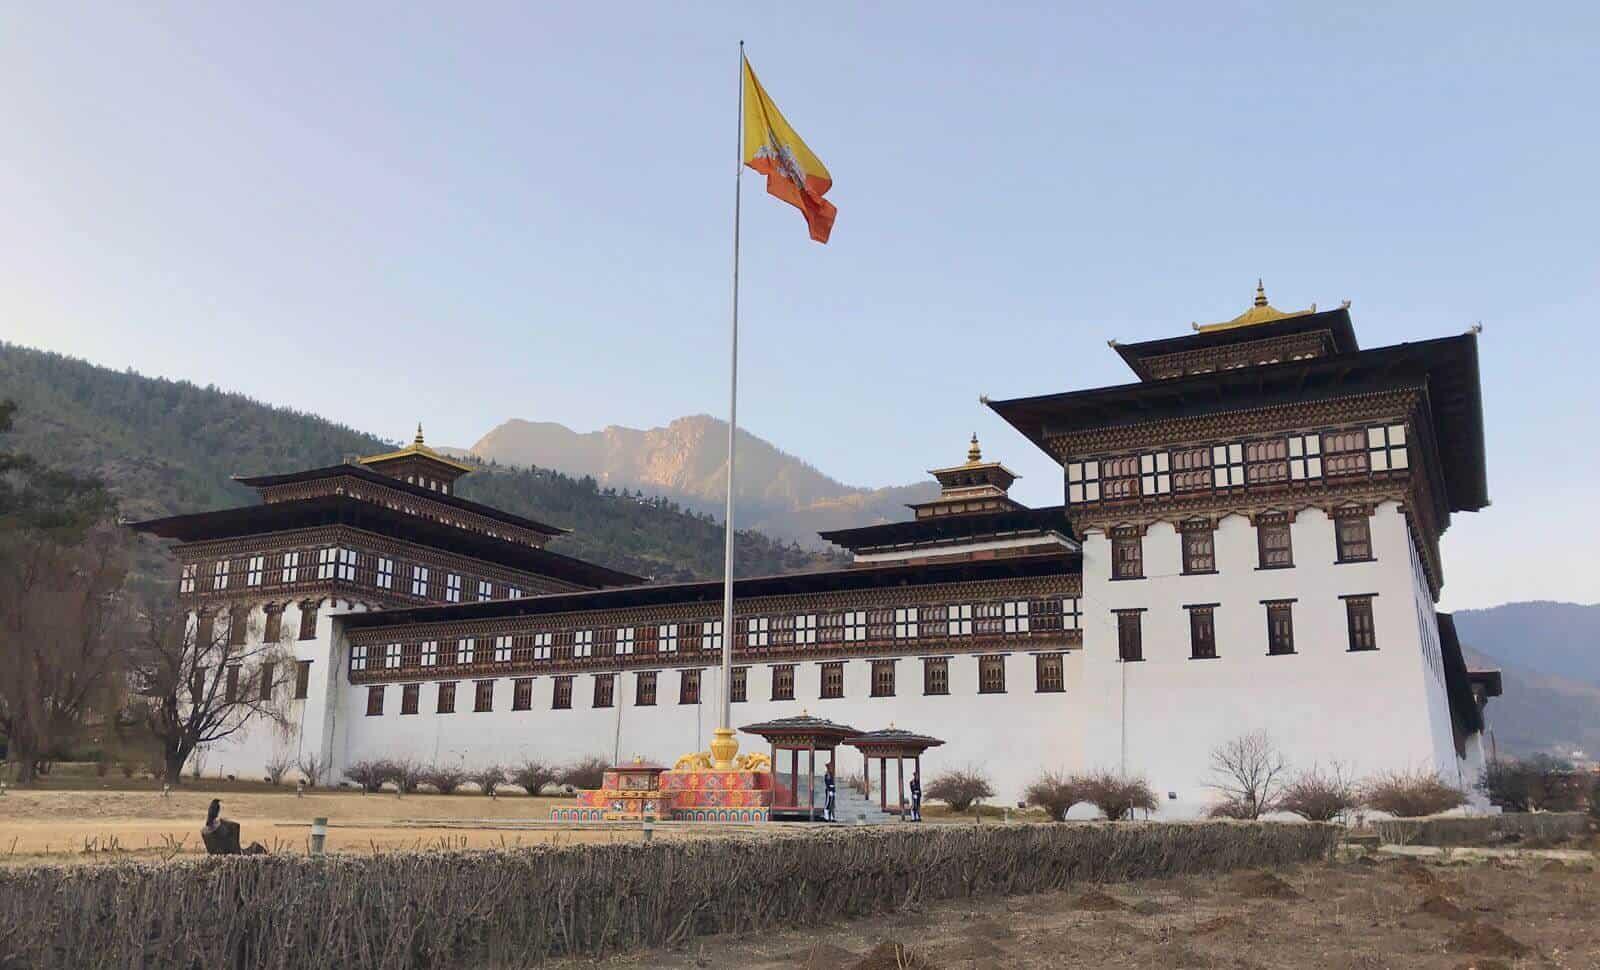 Thimpu betternotstop